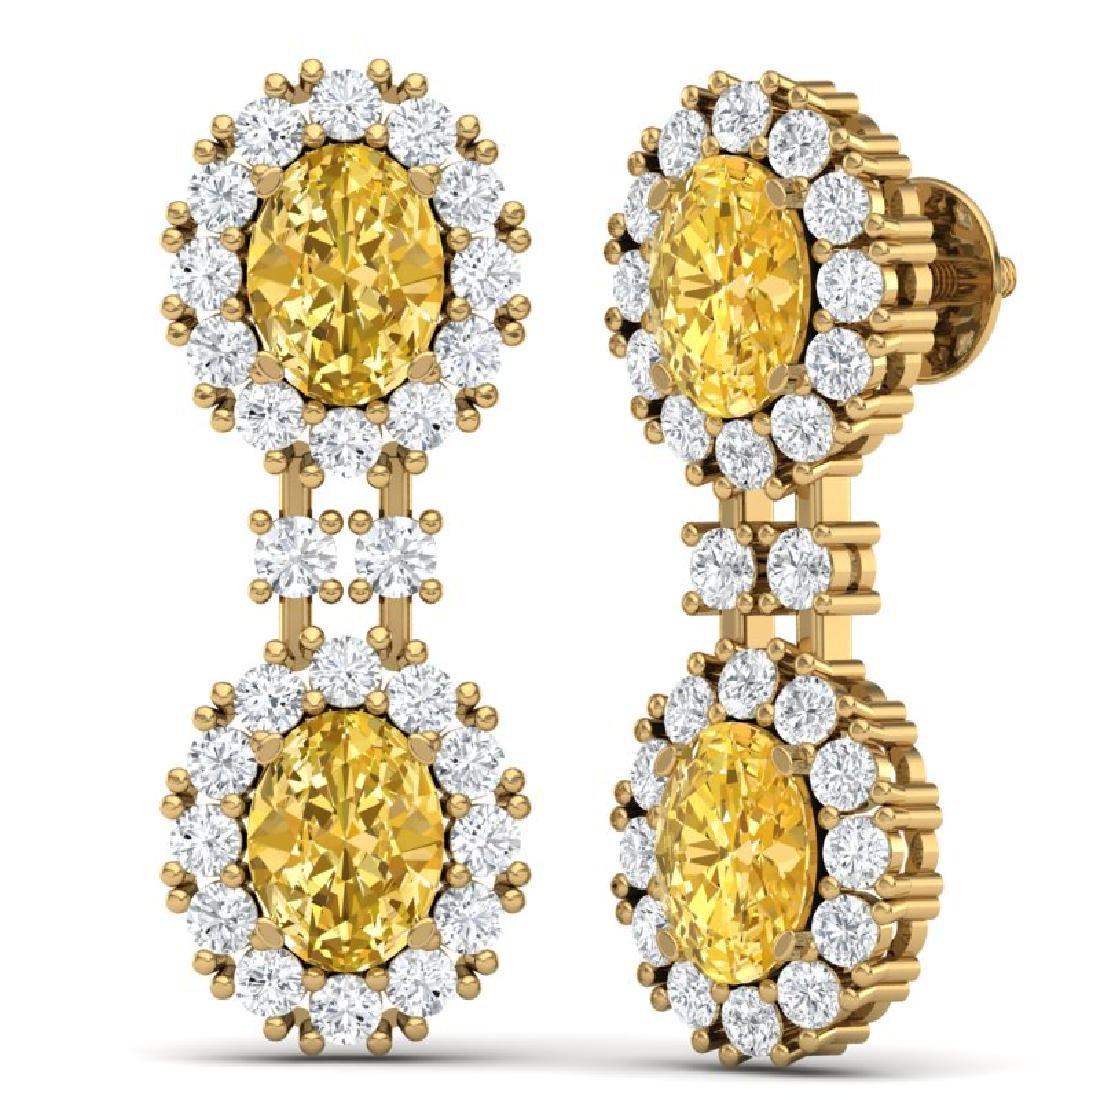 7.8 CTW Royalty Canary Citrine & VS Diamond Earrings - 3